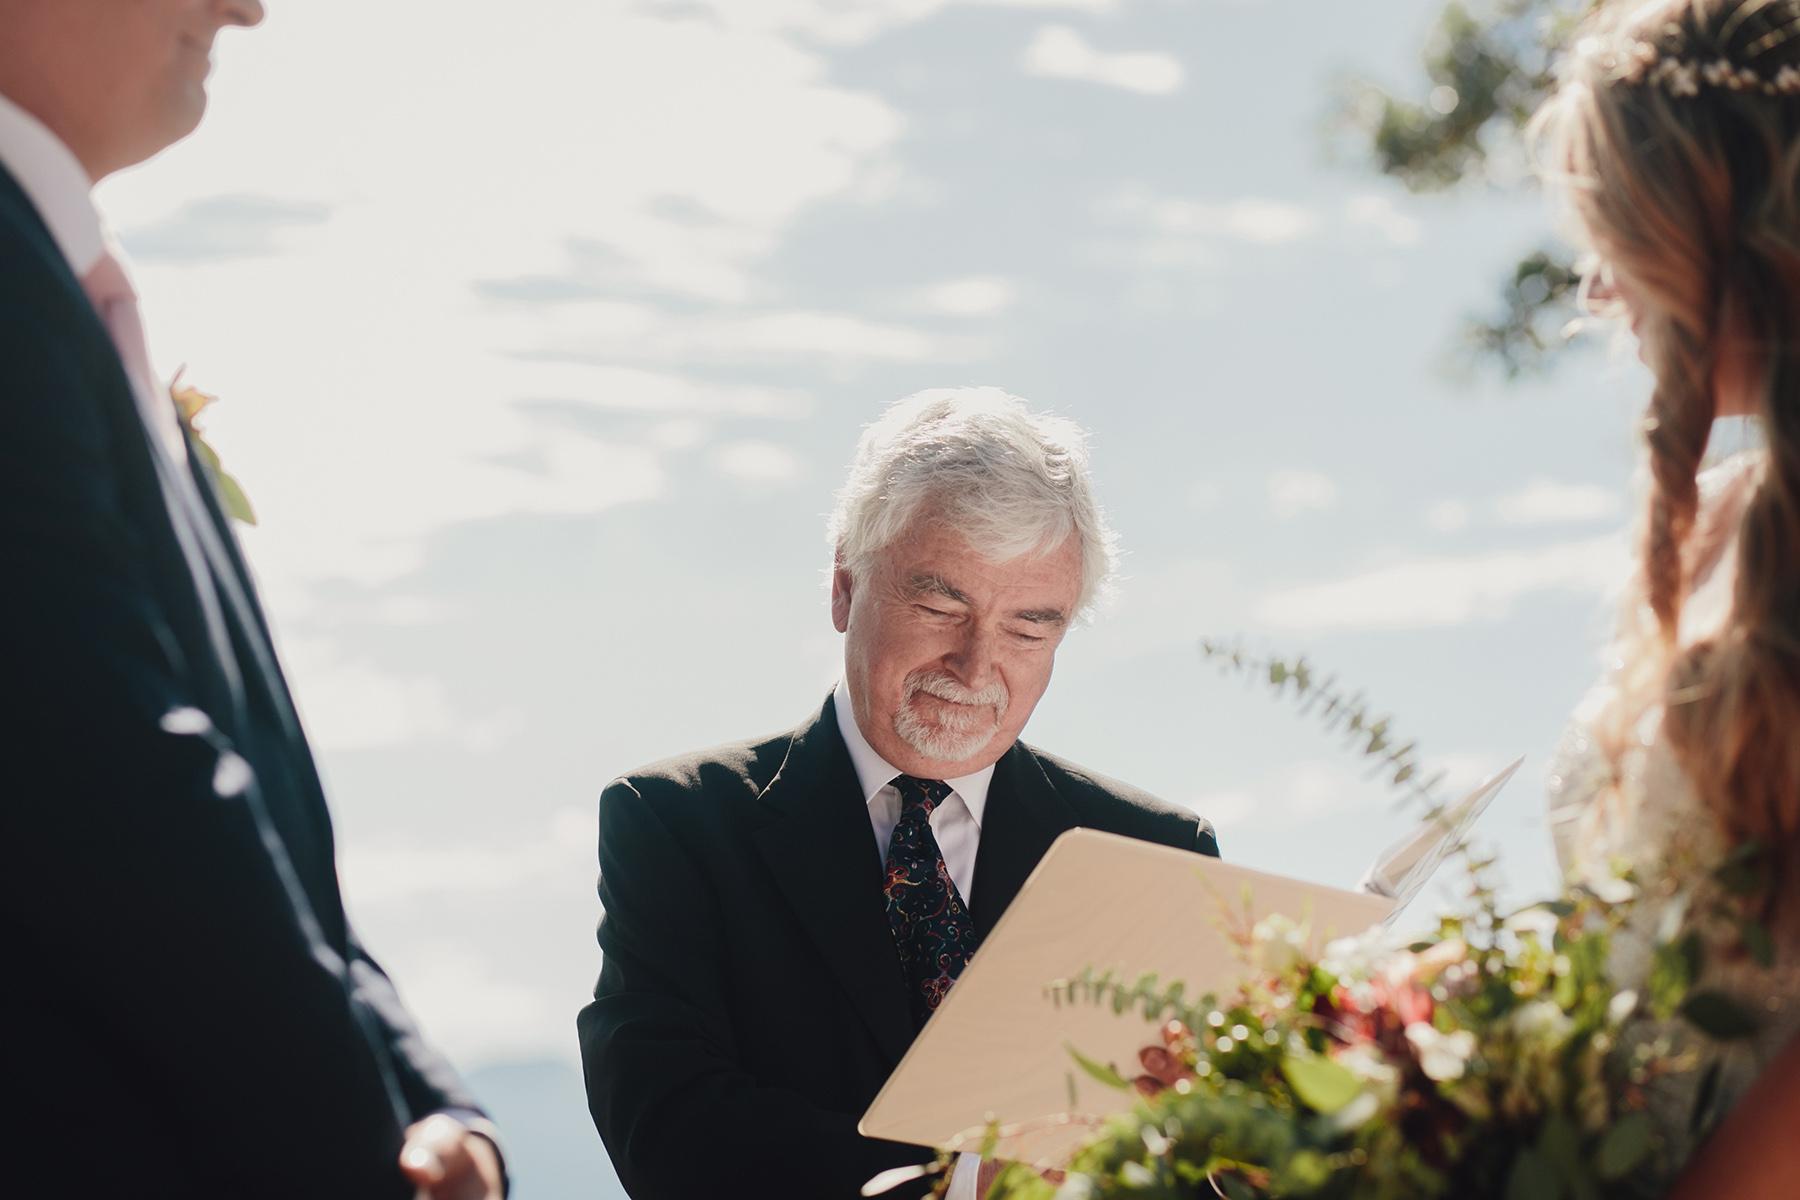 galiano-island-bodega-destination-wedding-0055.JPG